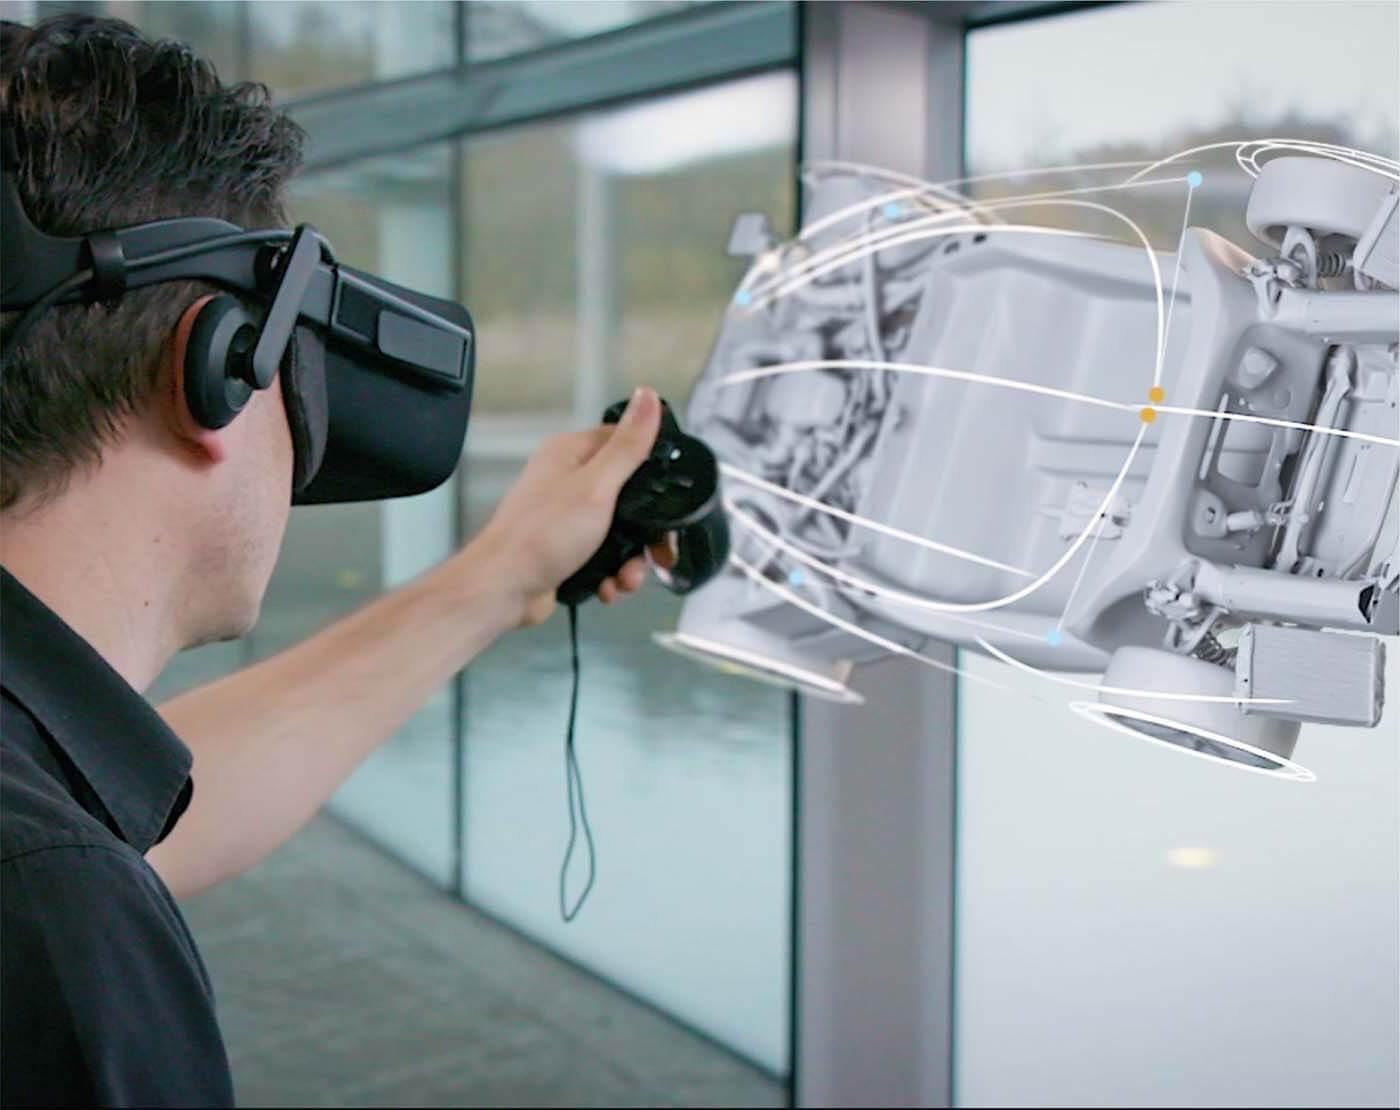 Wizualizacje real-time 3D